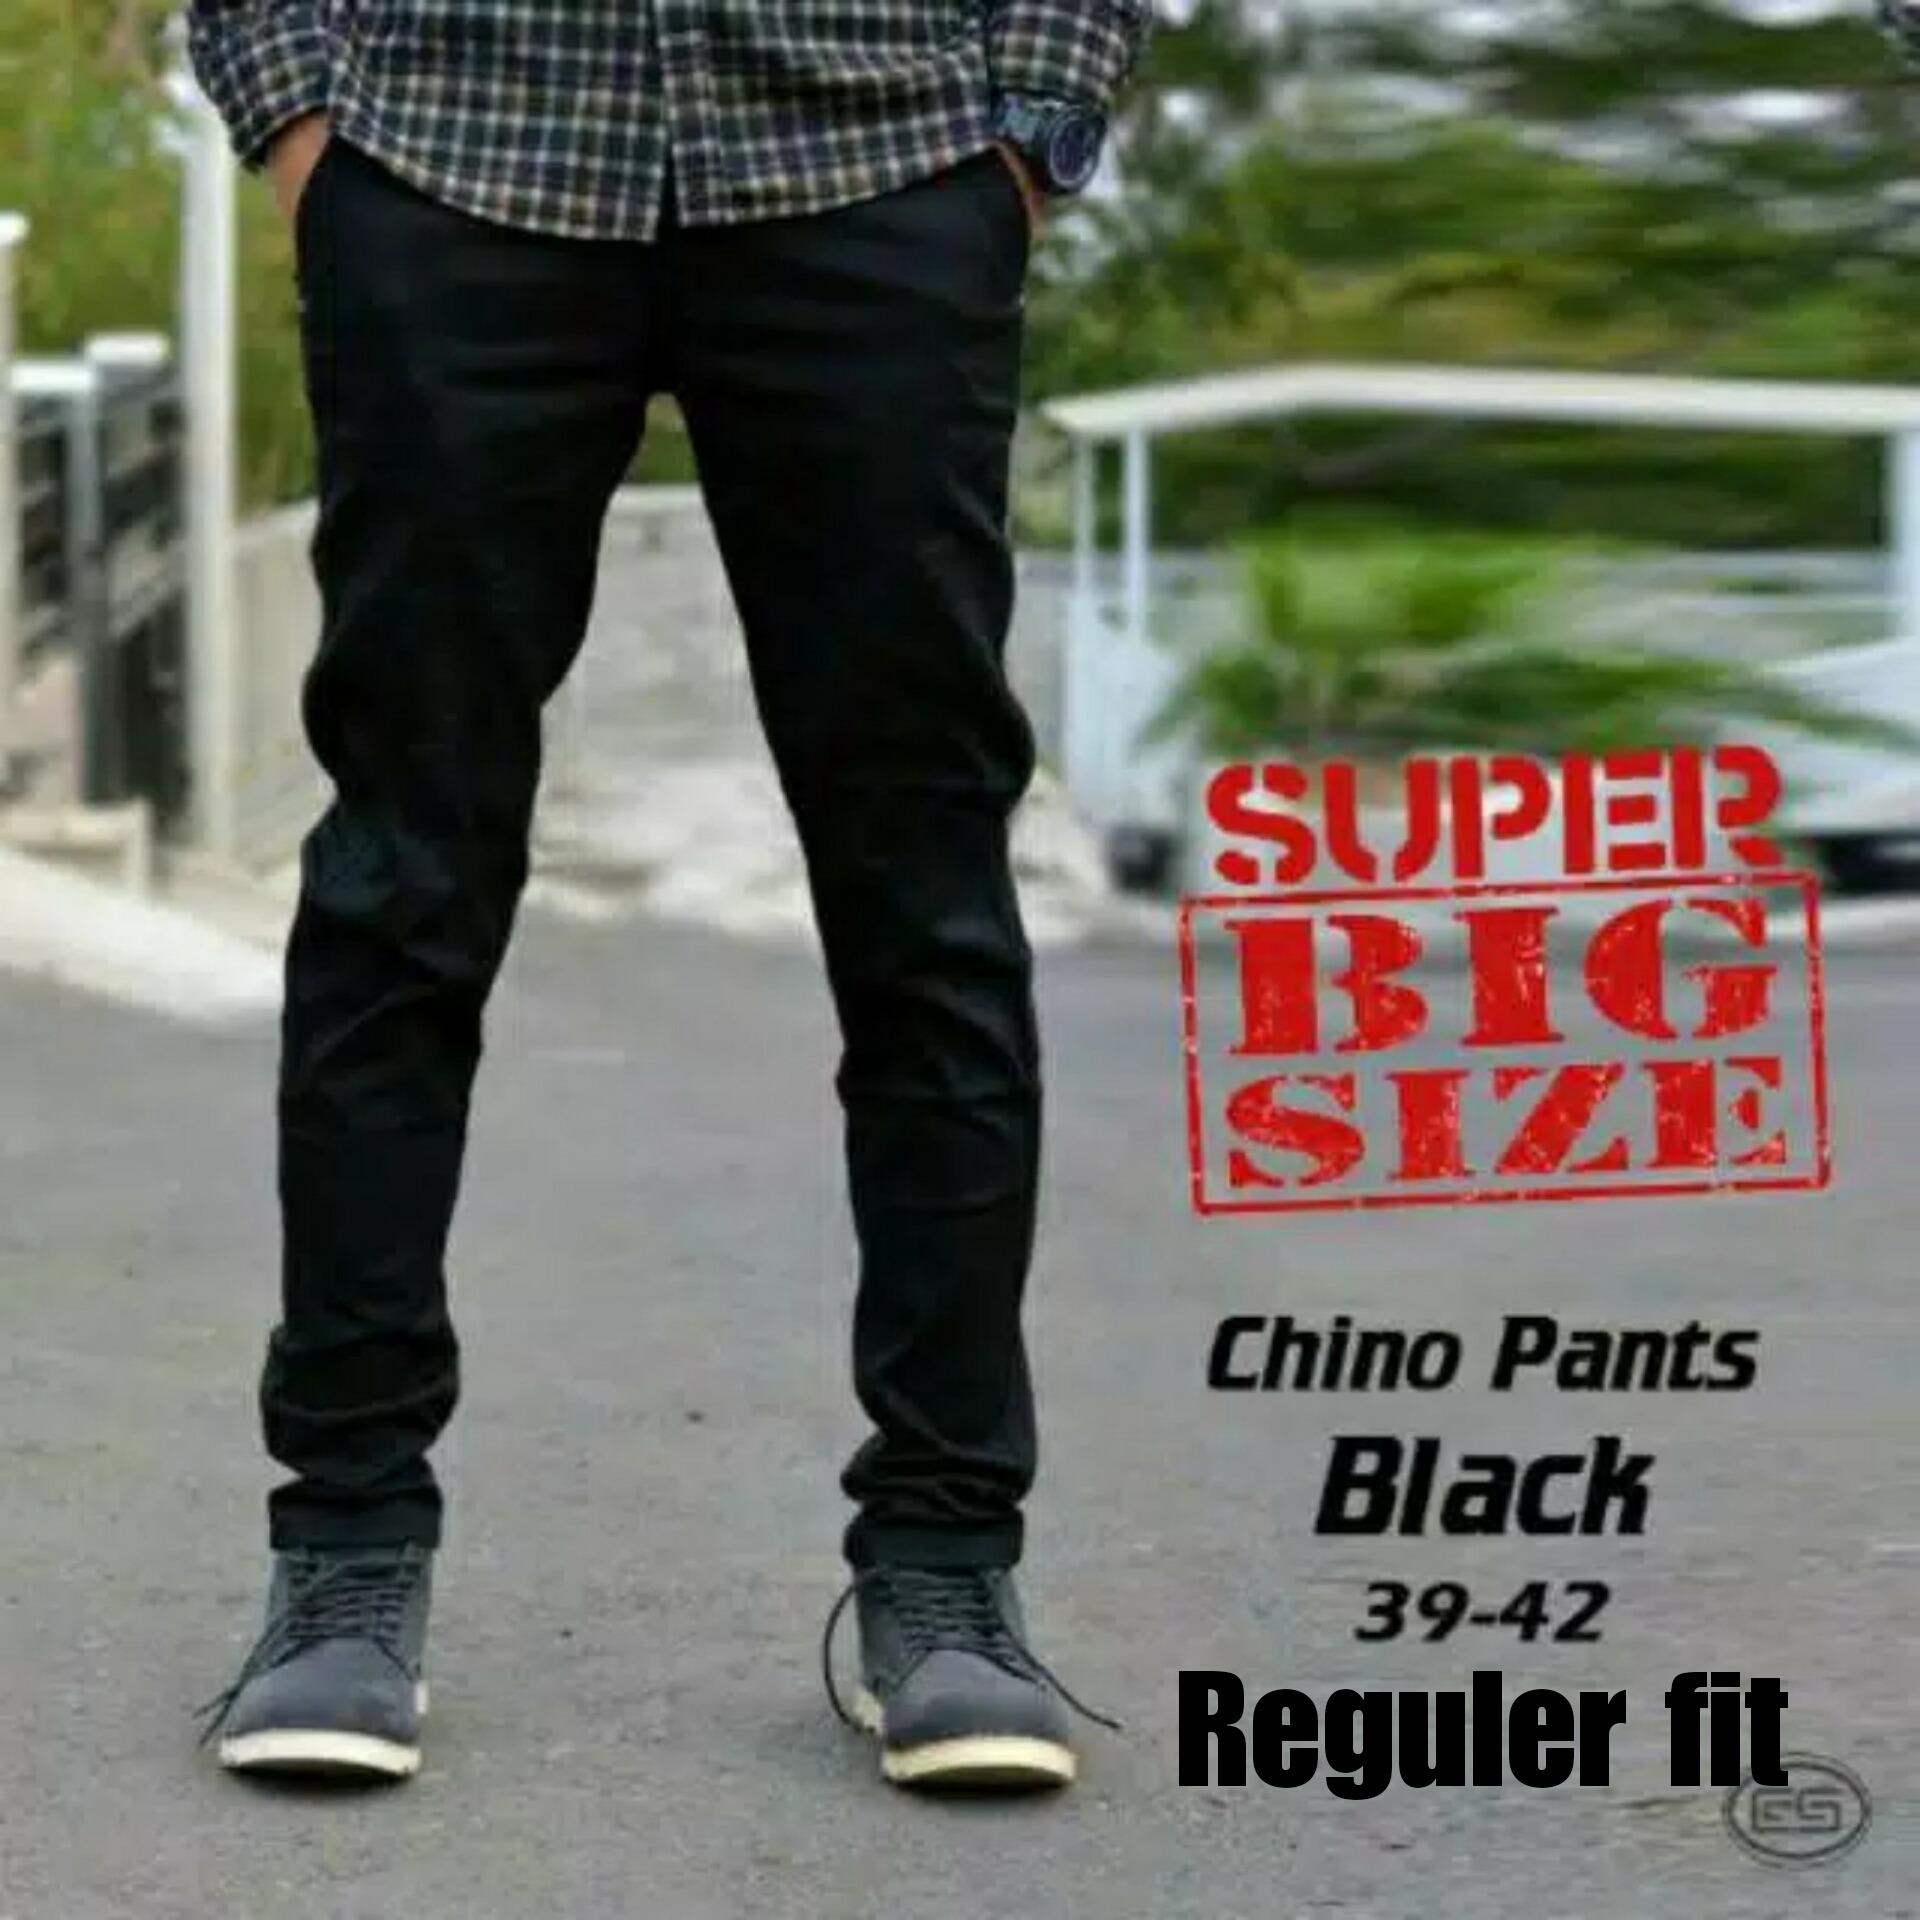 Beli Celana Chino Jumbo Premium Hitam Cicil